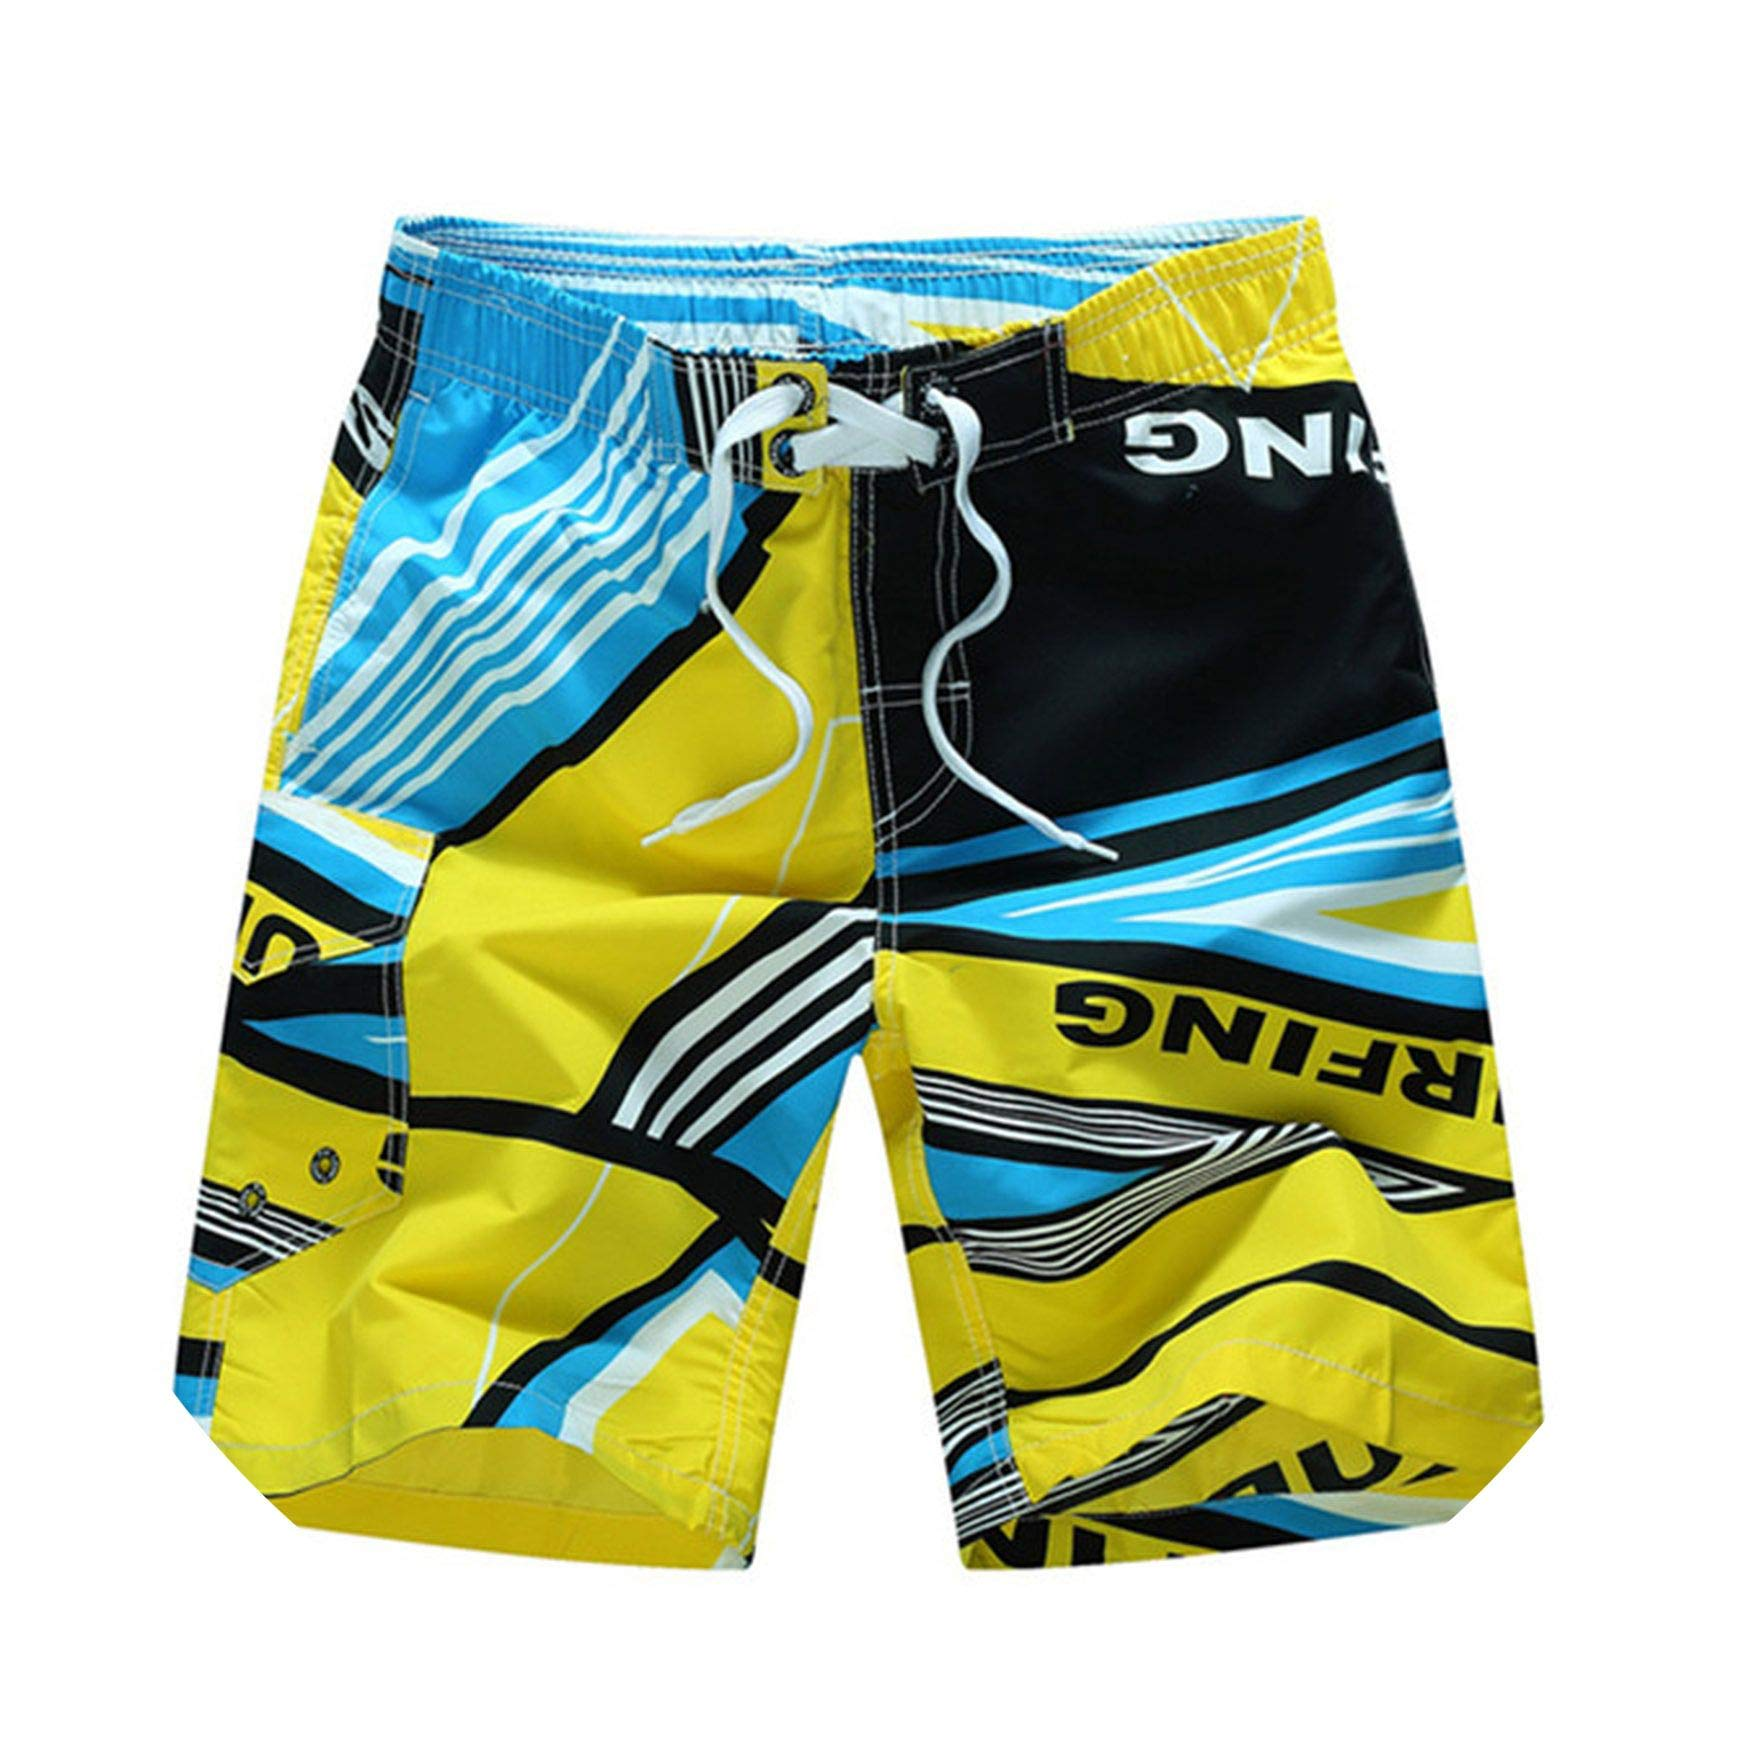 Swimming Shorts for Men Swim Shorts Plus Size Swimwear Mens Swim Trunks Bermuda Surfing Beach wear Swimsuit 6XL,1521 Yellow,M by SMALL FAT